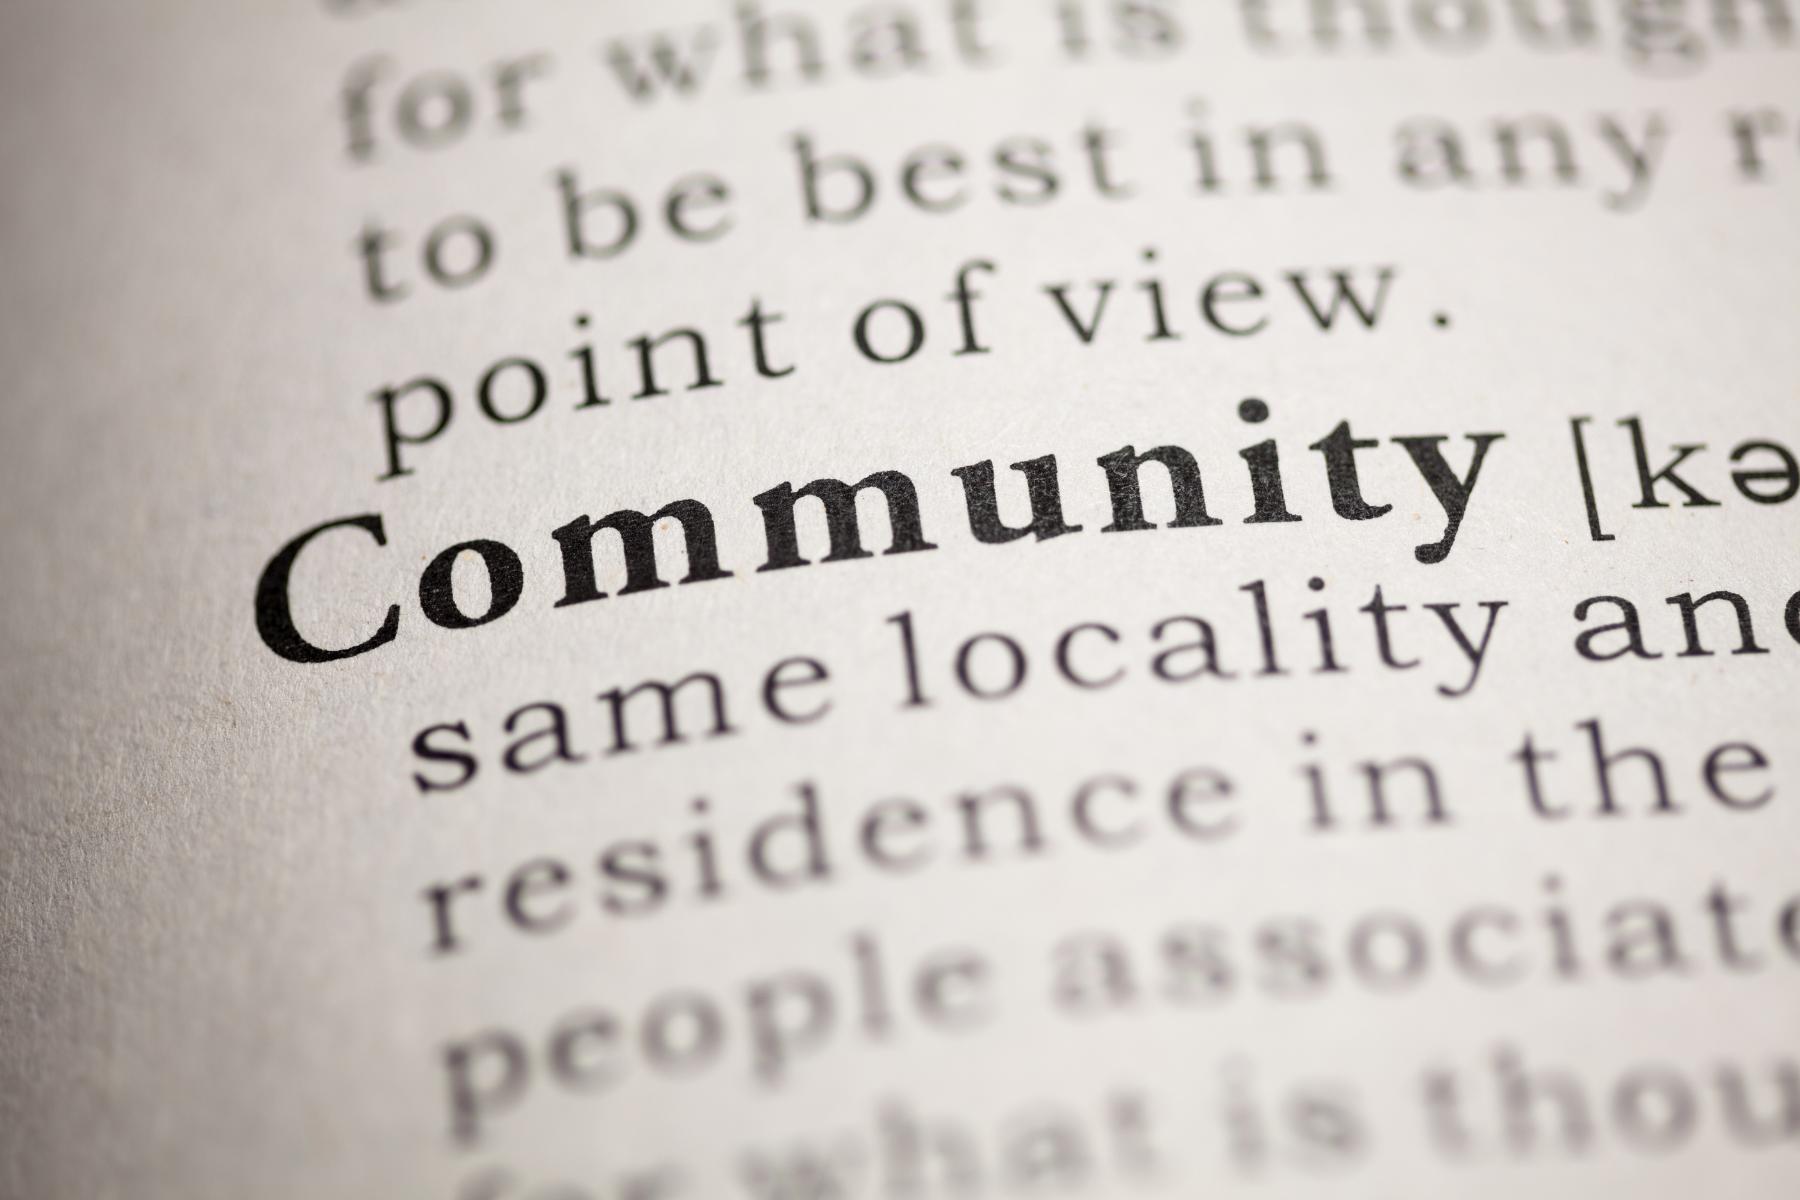 June - Month of Community